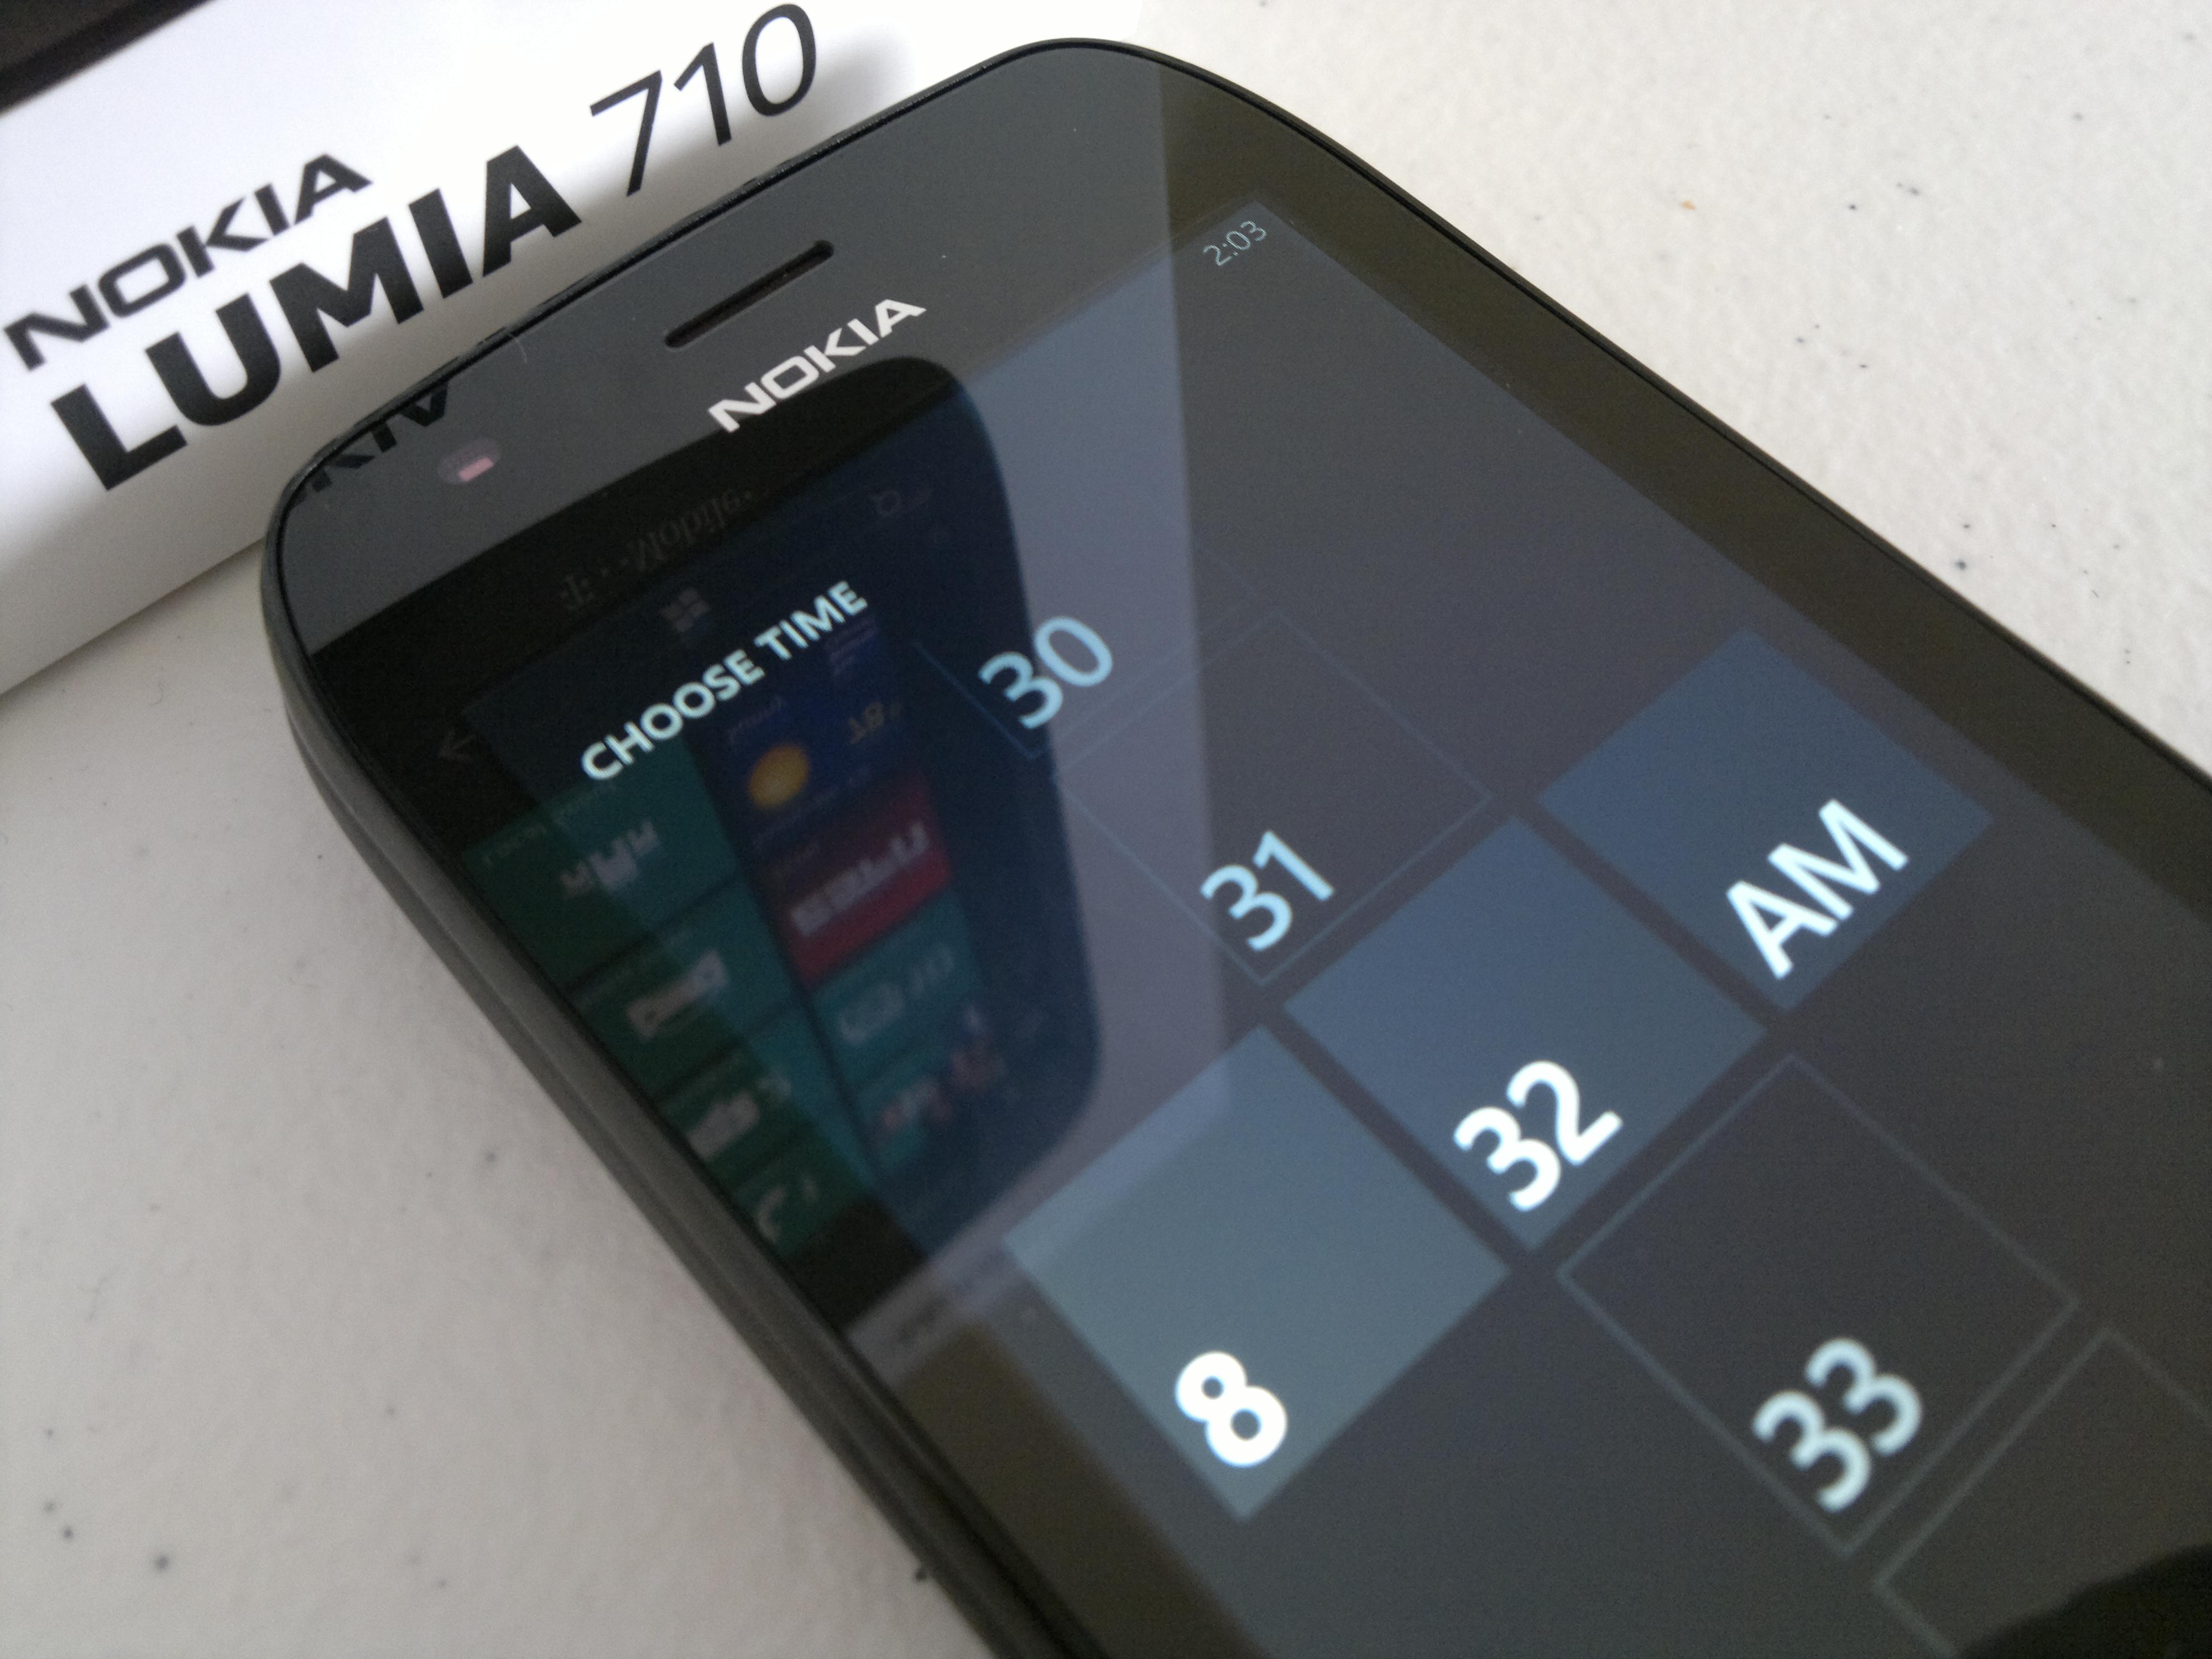 Time – How Long Lumia Phone?